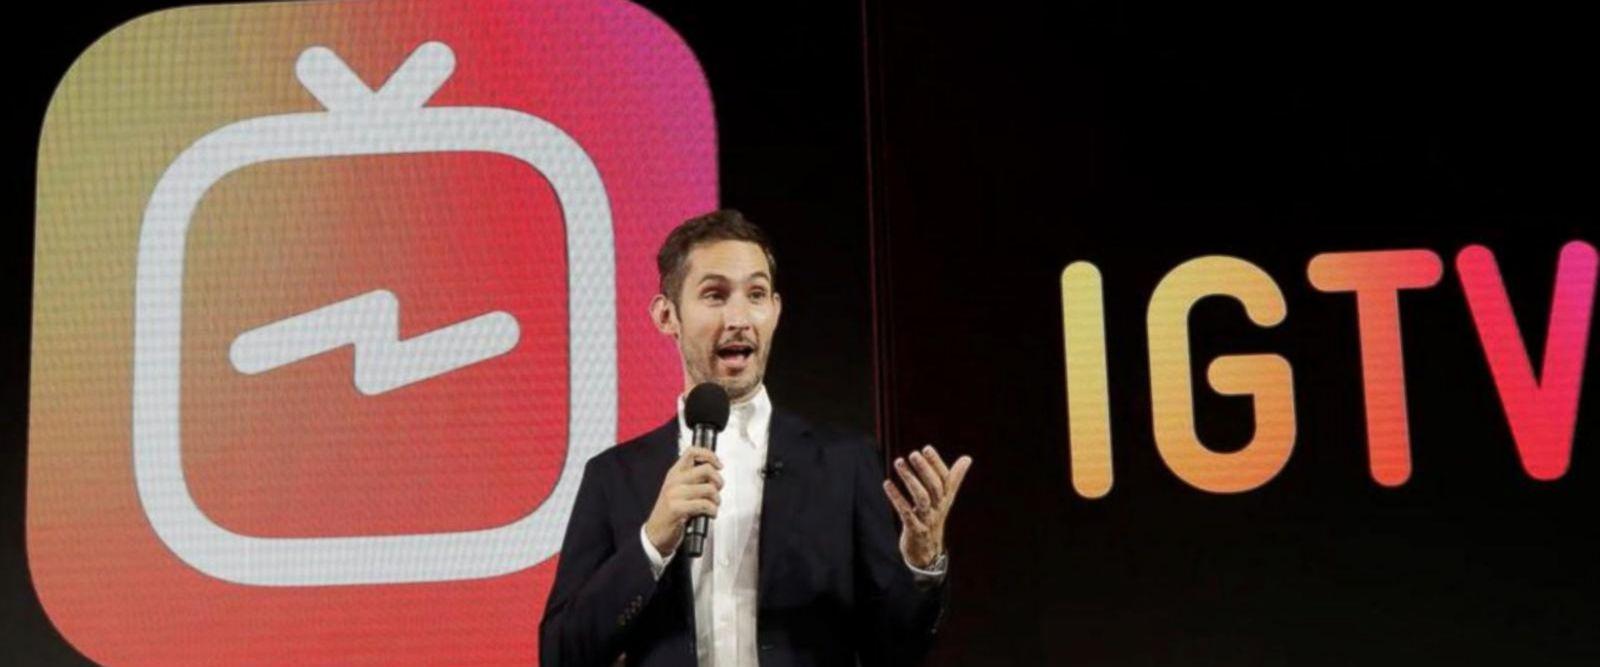 VIDEO: Instagram's IGTV goes Live